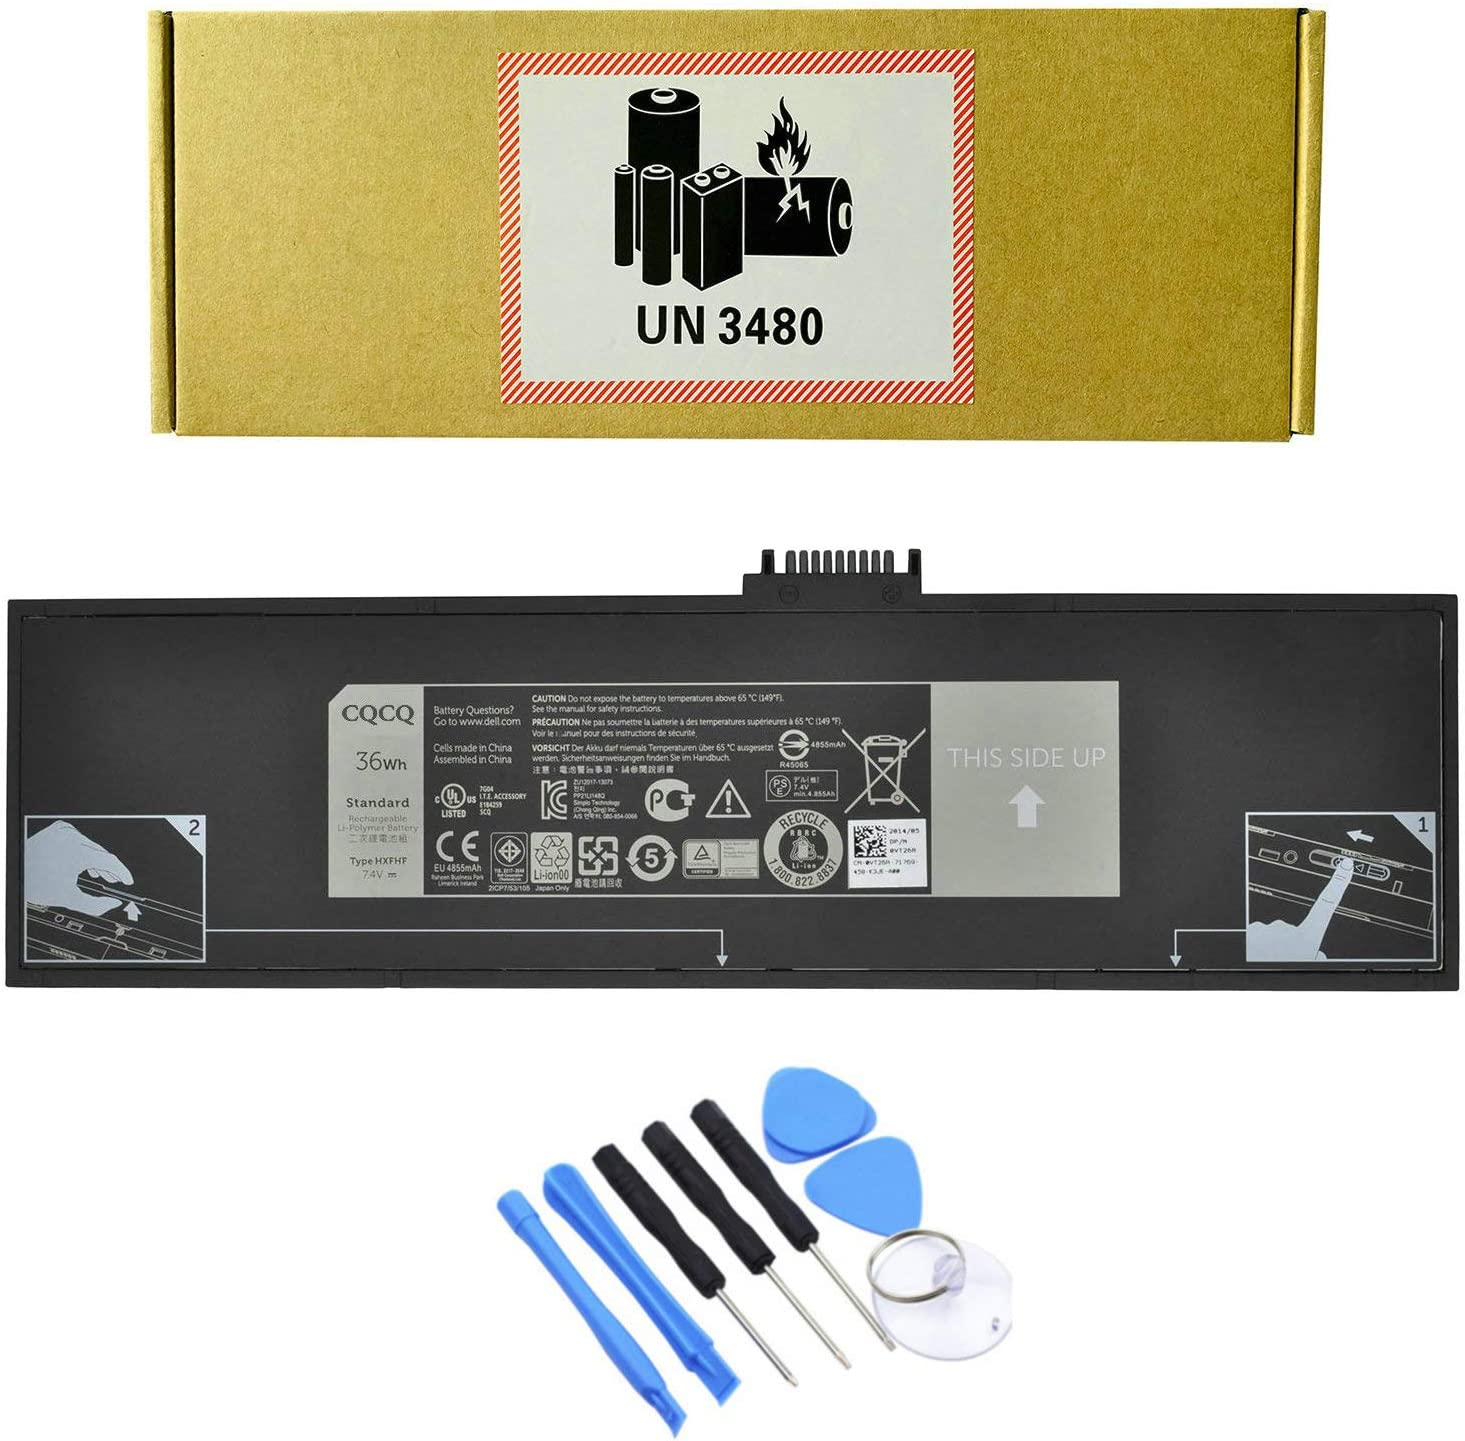 CQCQ HXFHF Battery for Dell Venue 11 Pro 7130 7139 T07G001 Tablet Series VJF0X VT26R XNY66 451-BBGR 0VT26R Laptop (7.4V 36Wh)